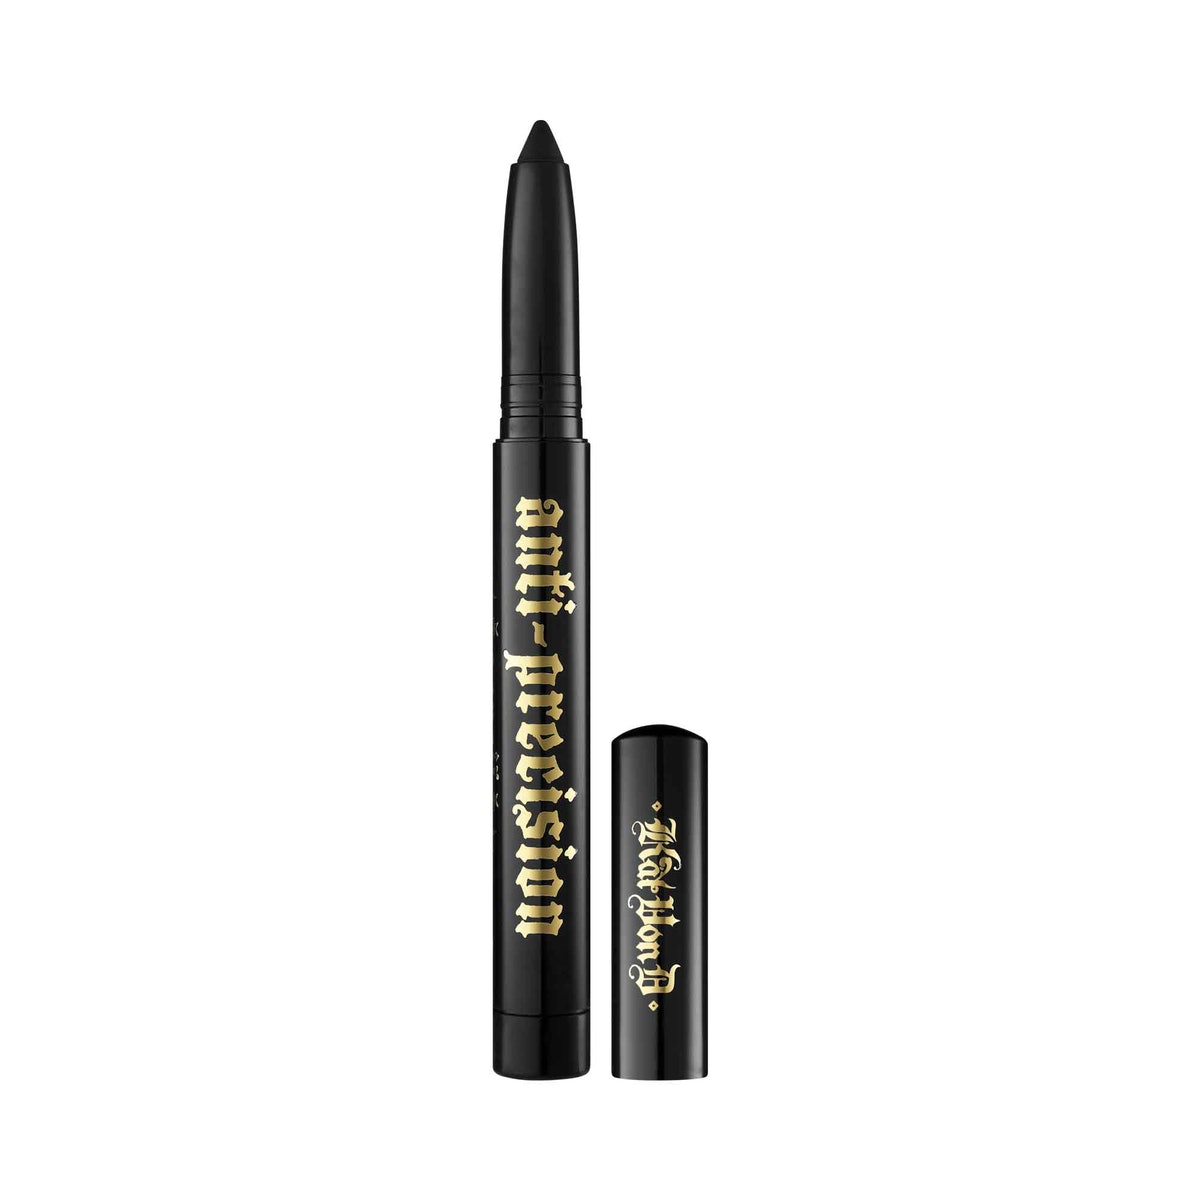 Kat Von D Beauty Anti-Precision Pencil Eyeliner